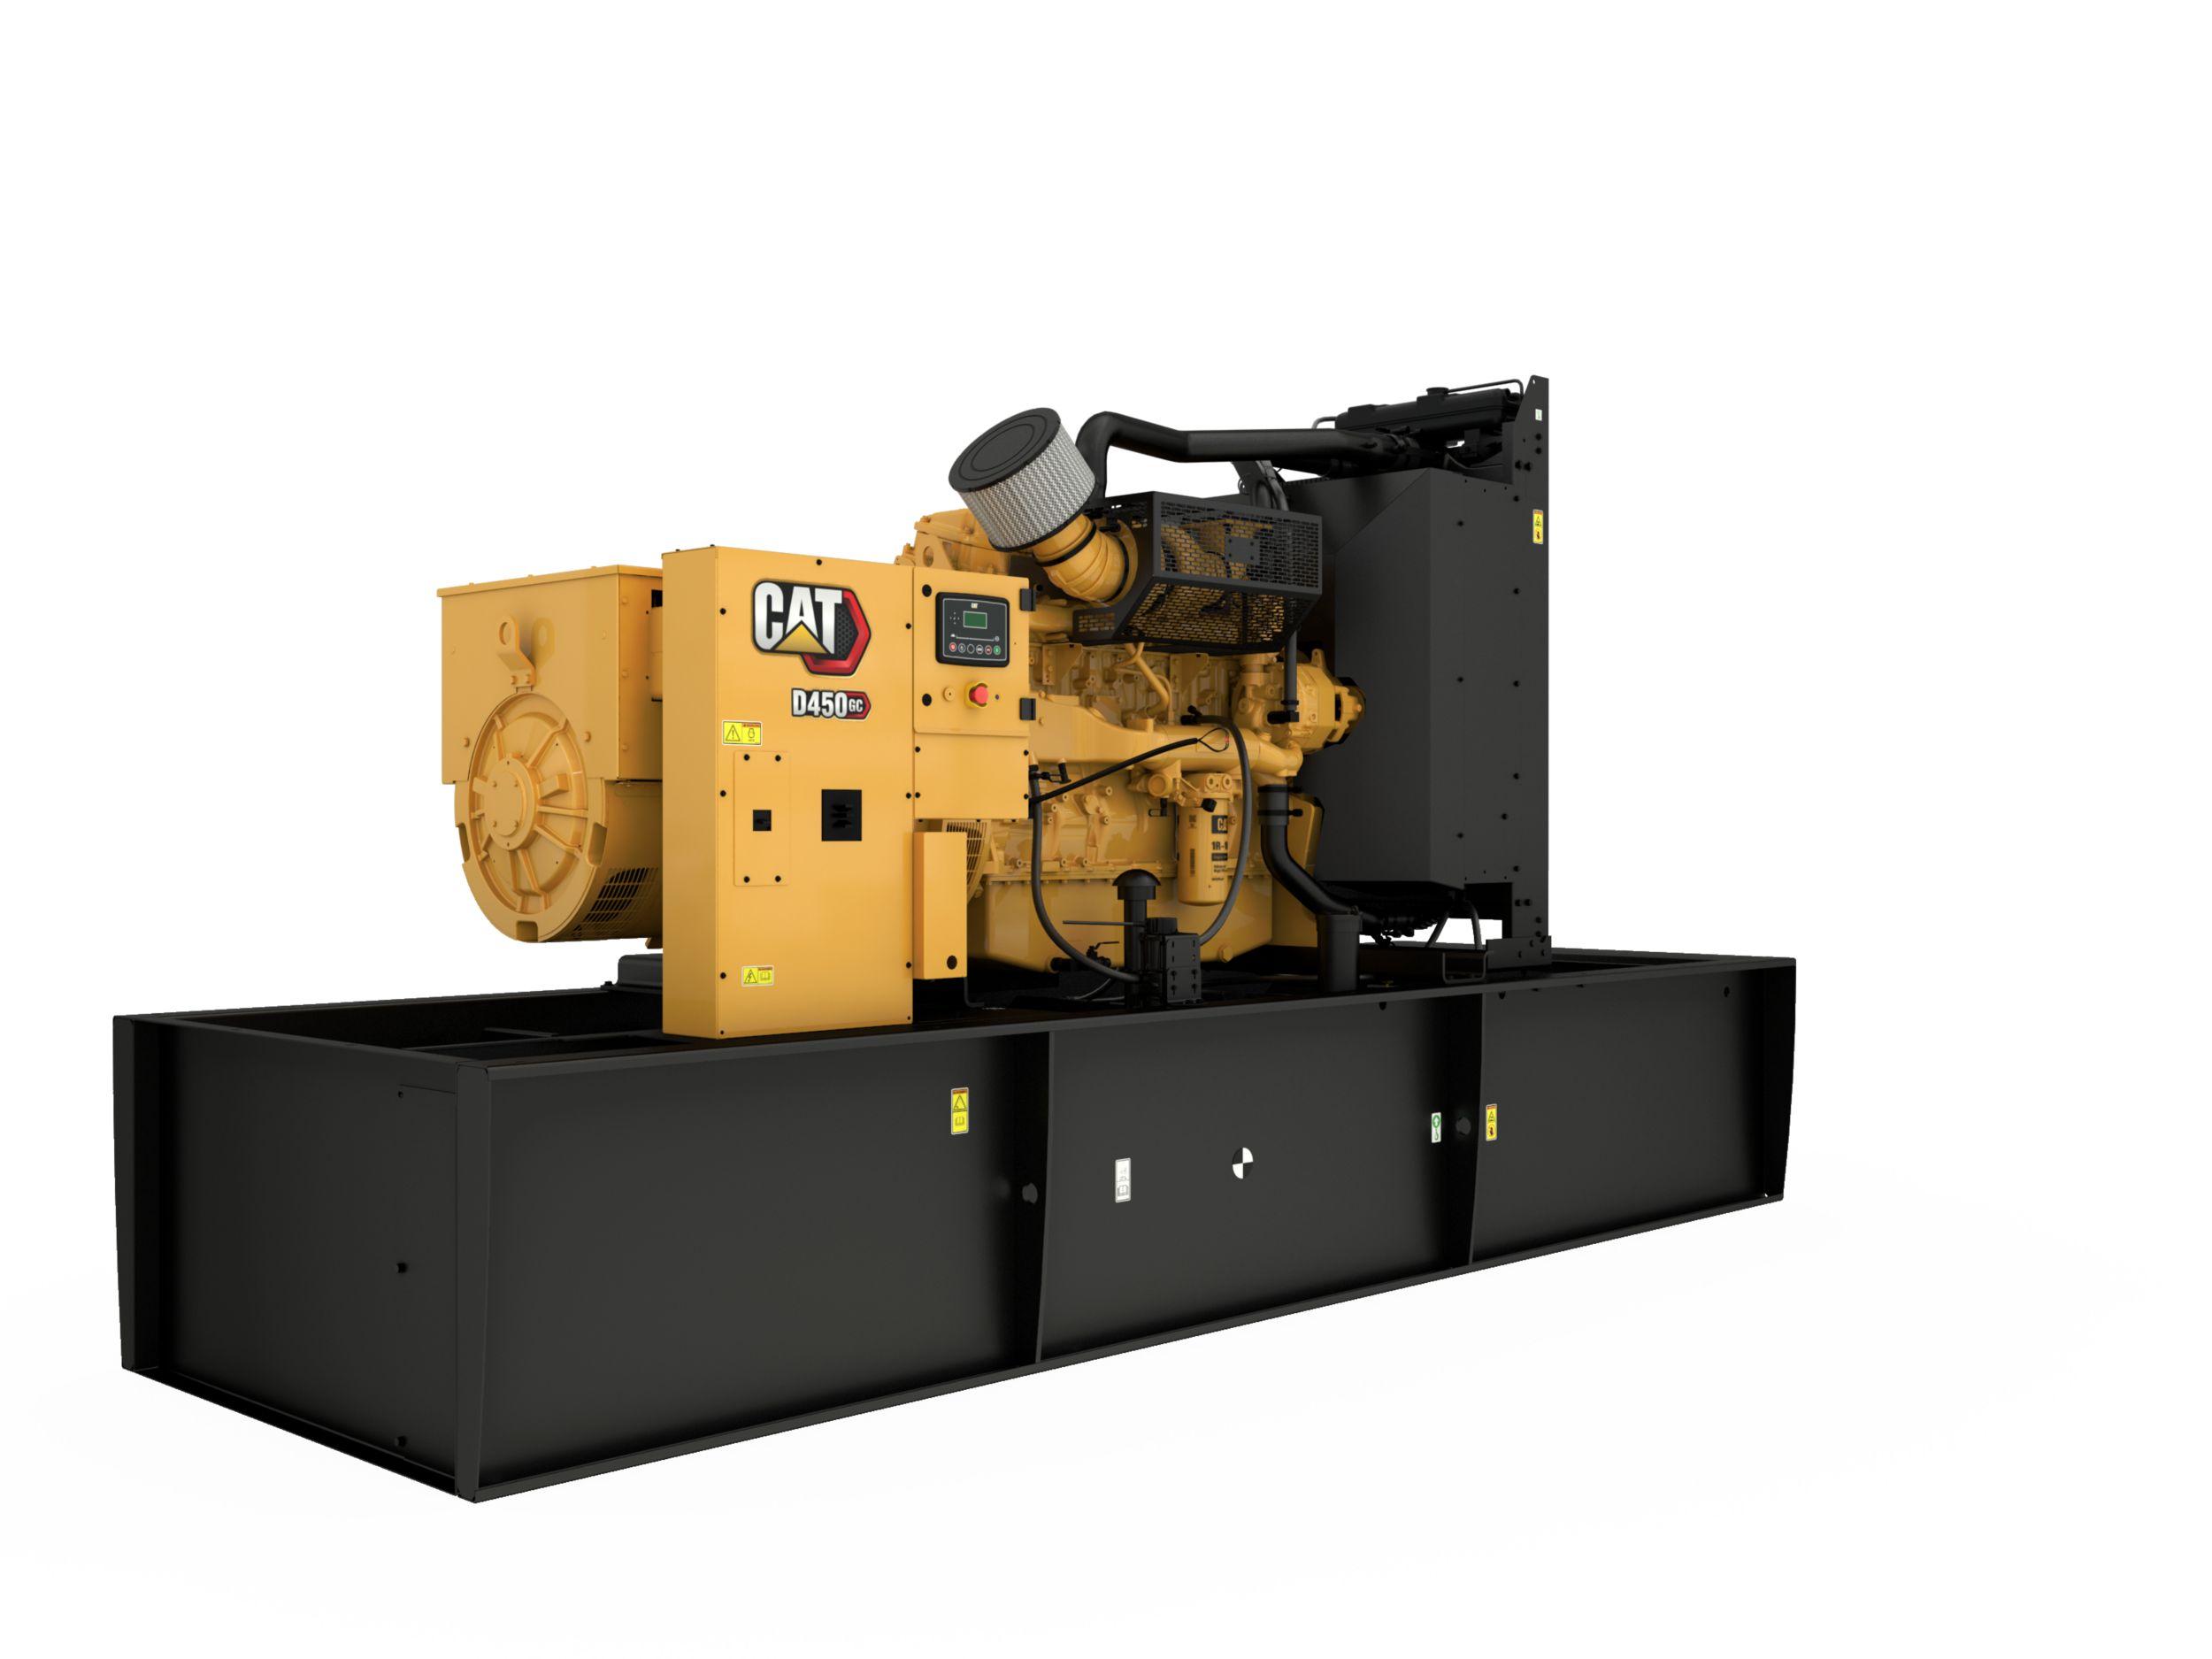 D450 GC (60 Hz) Generator Set